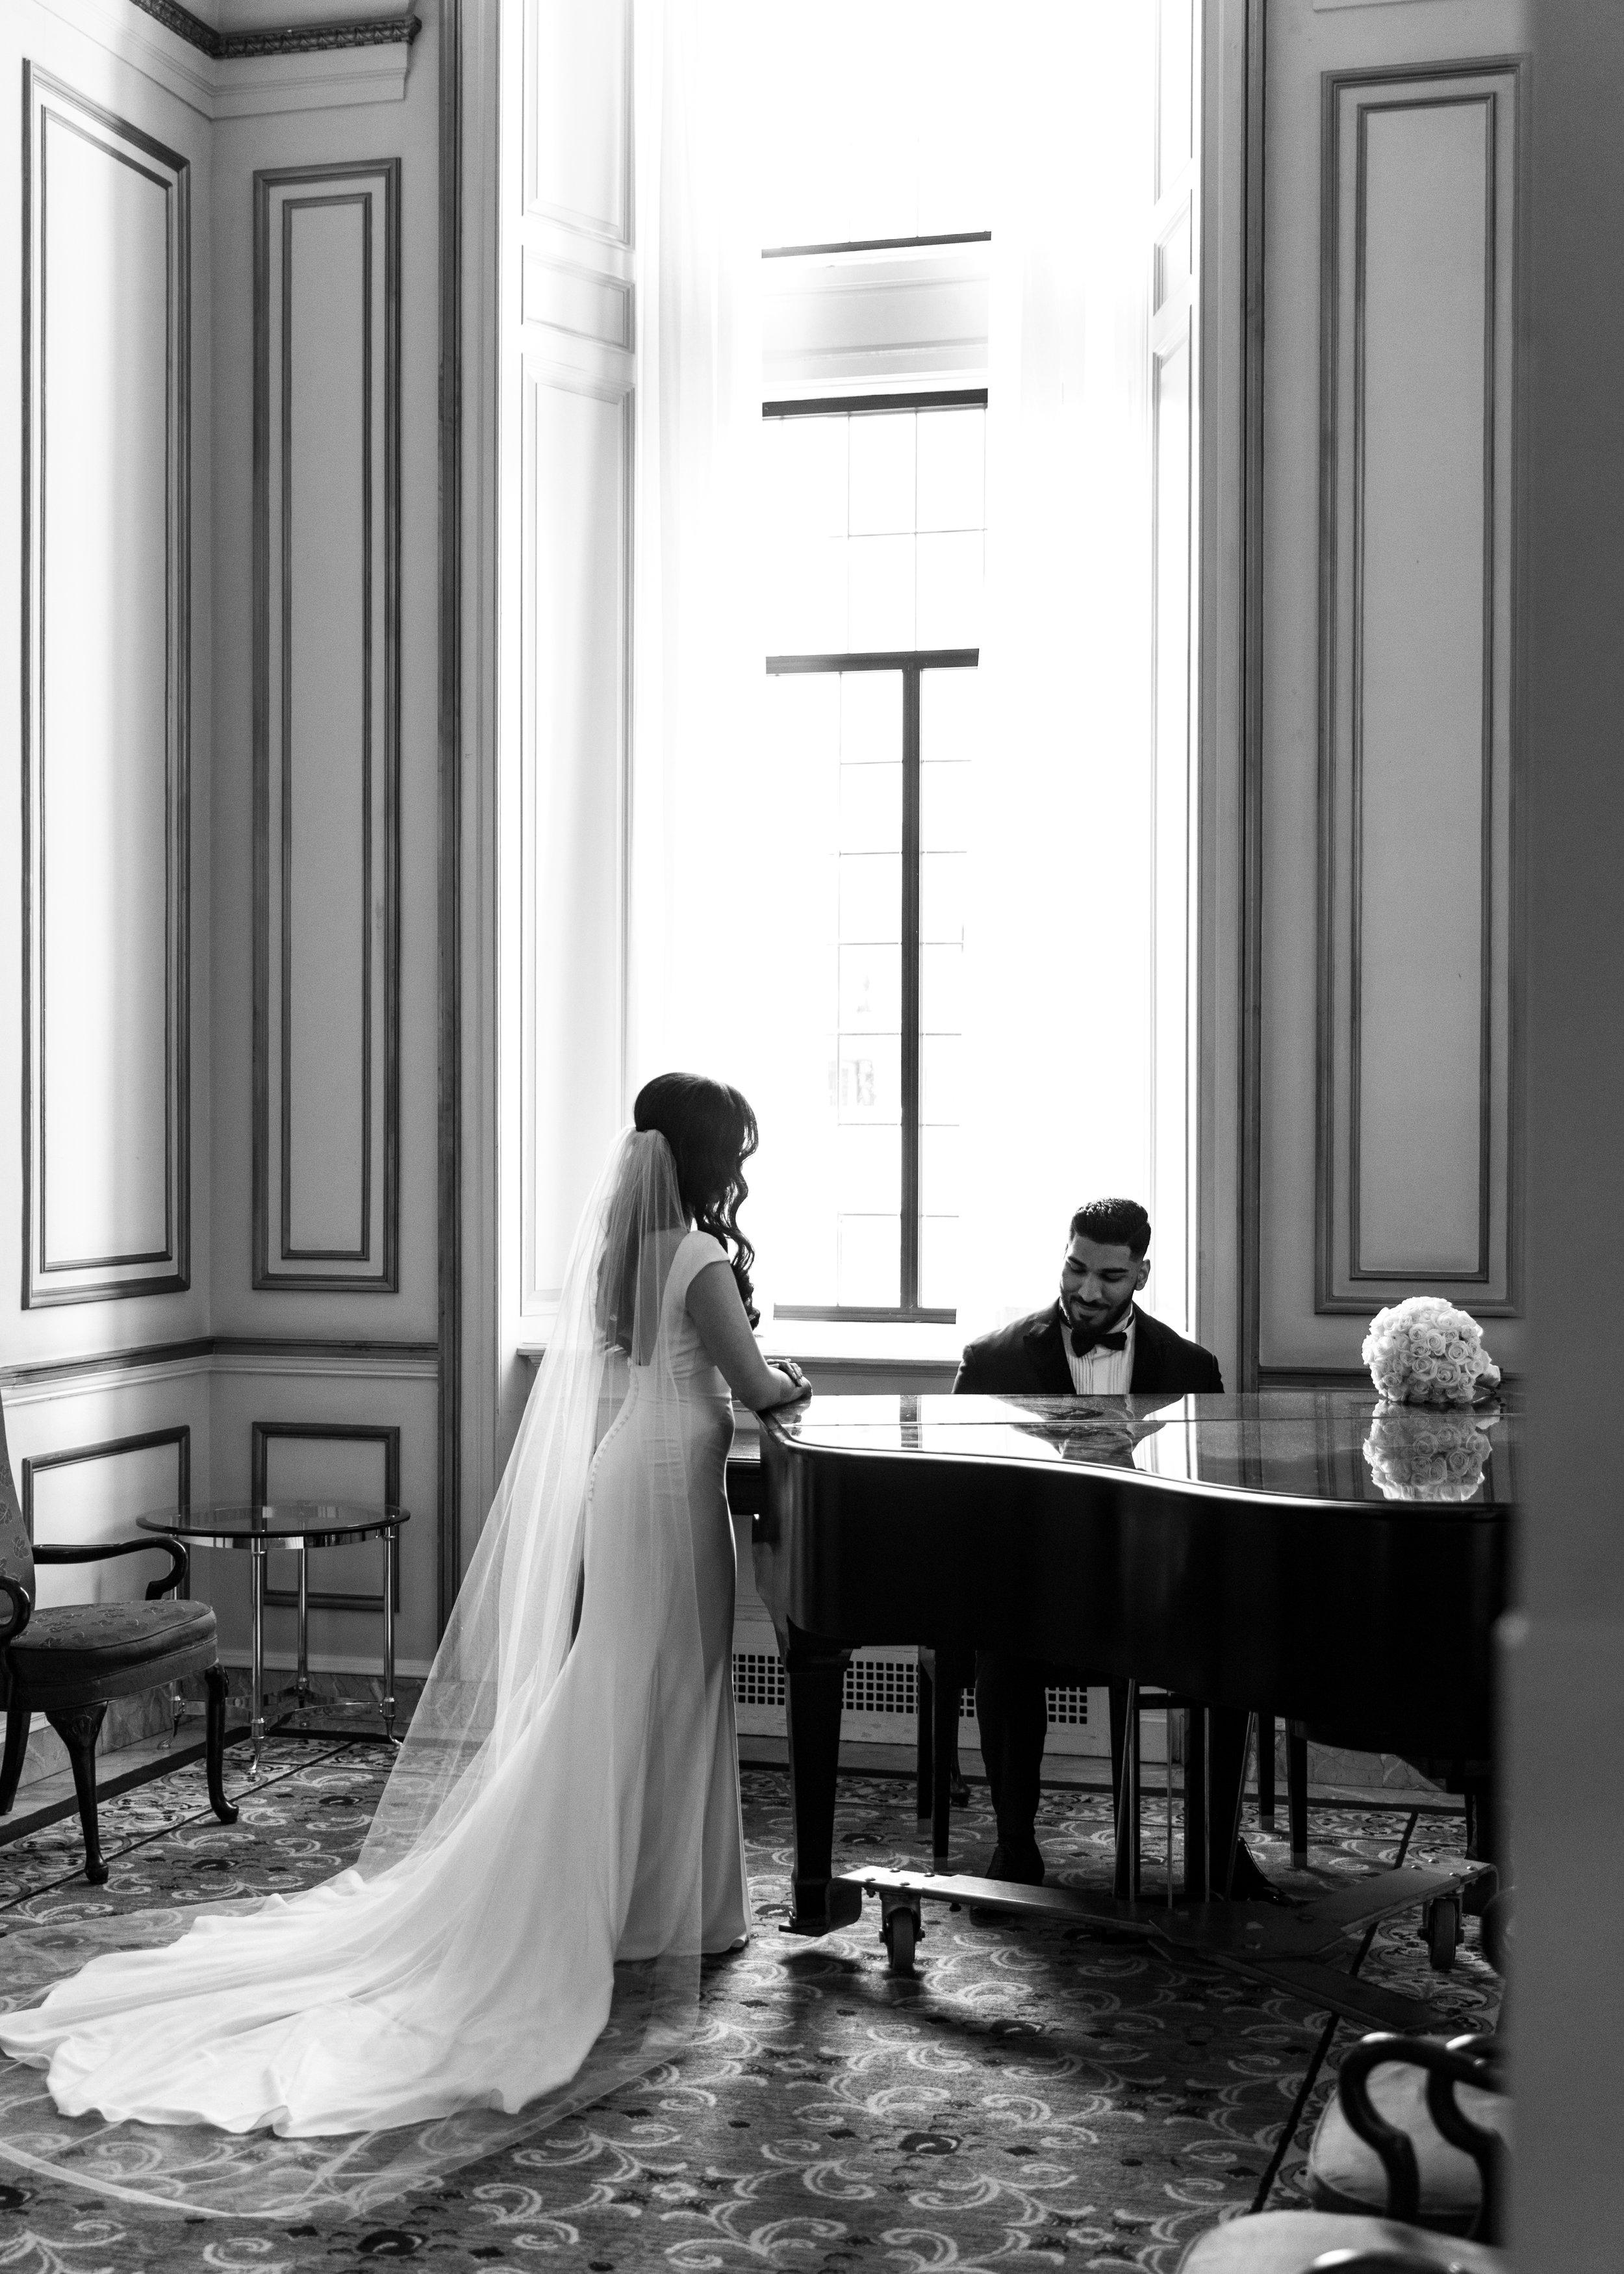 herastudios_wedding_aneesha_kris_hera_selects-35.jpg